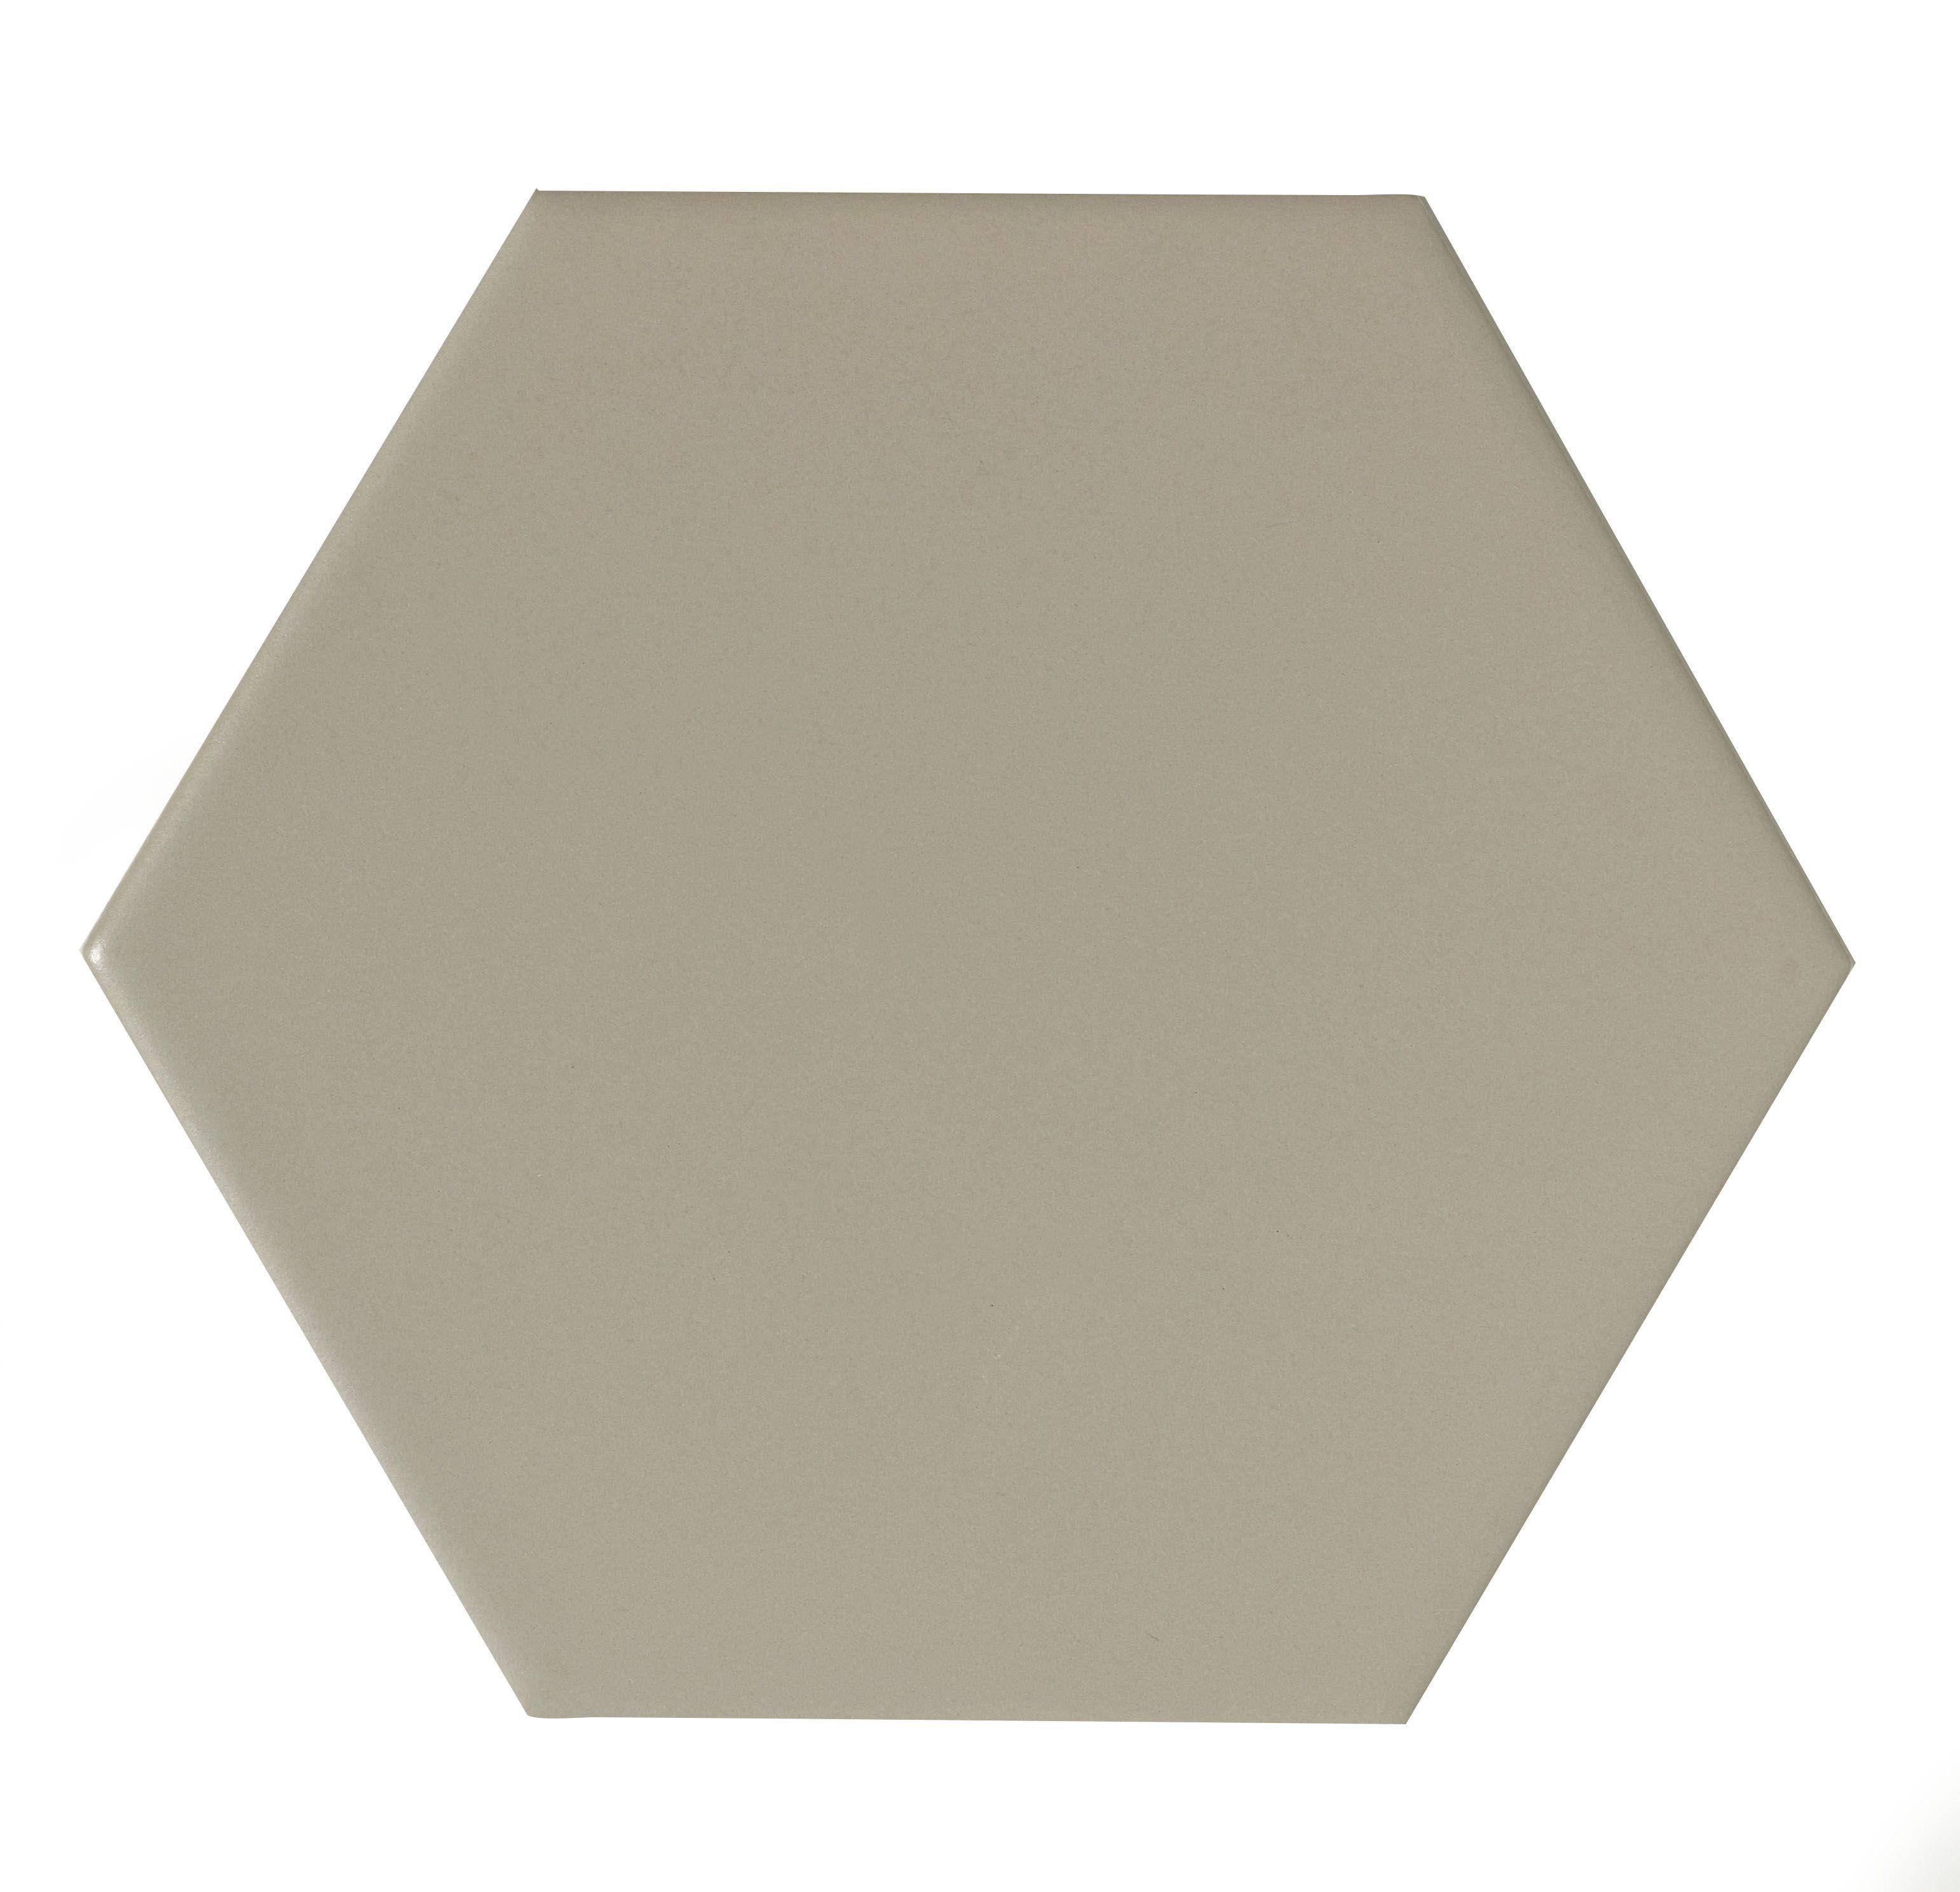 Origin Sand Stone Effect Linear Travertine Ceramic Wall: Tile Design Ideas